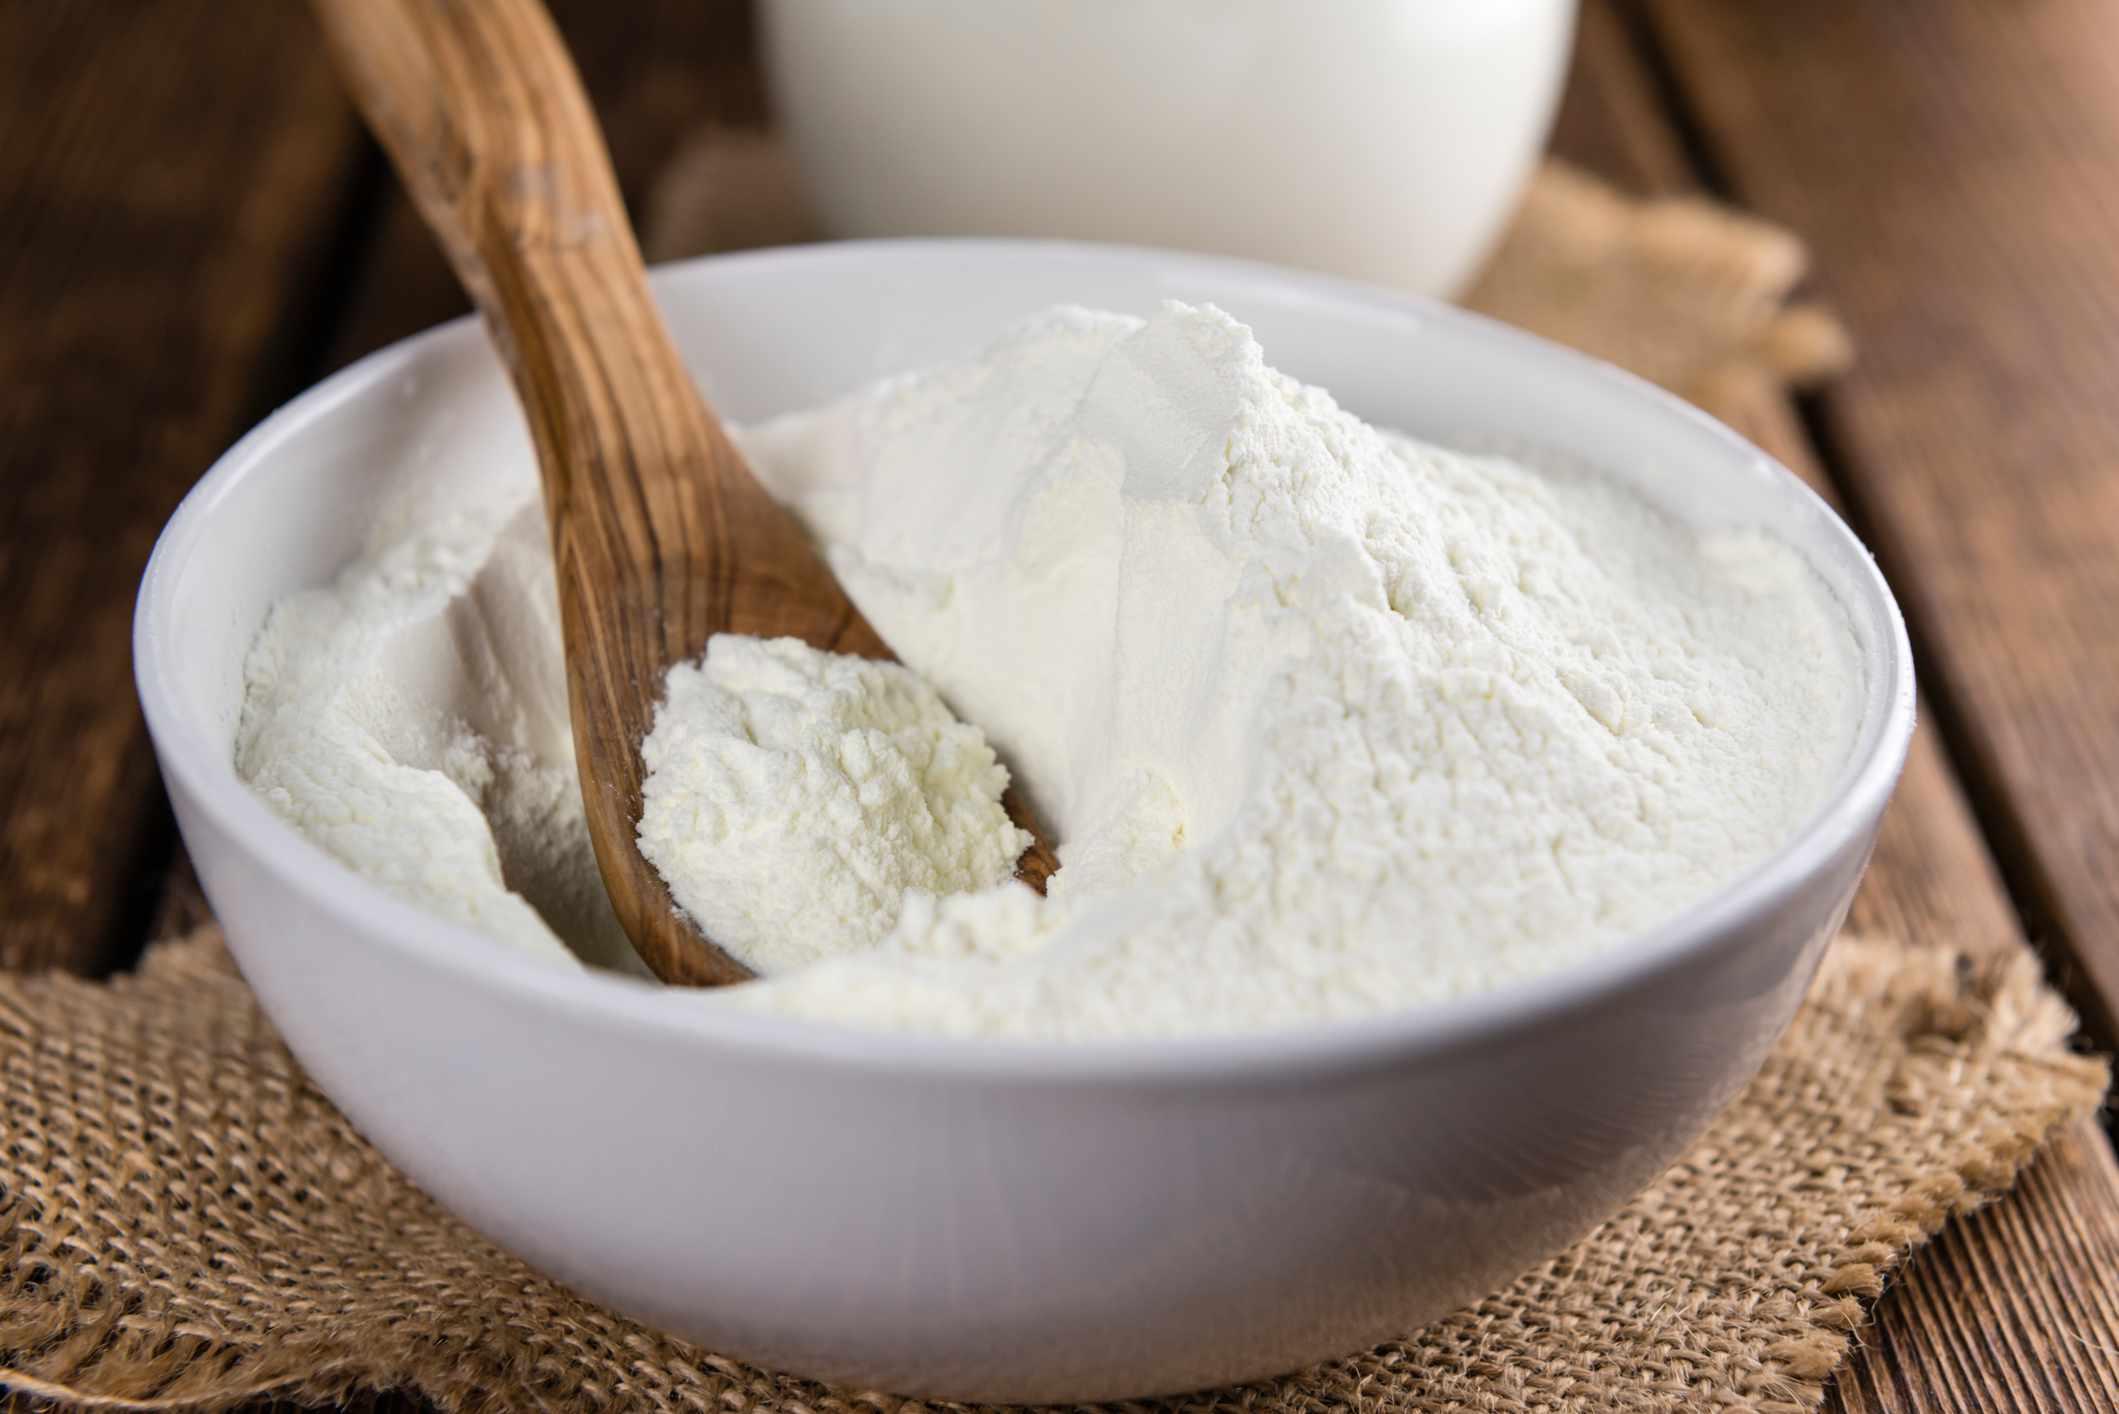 Portion of Milk Powder